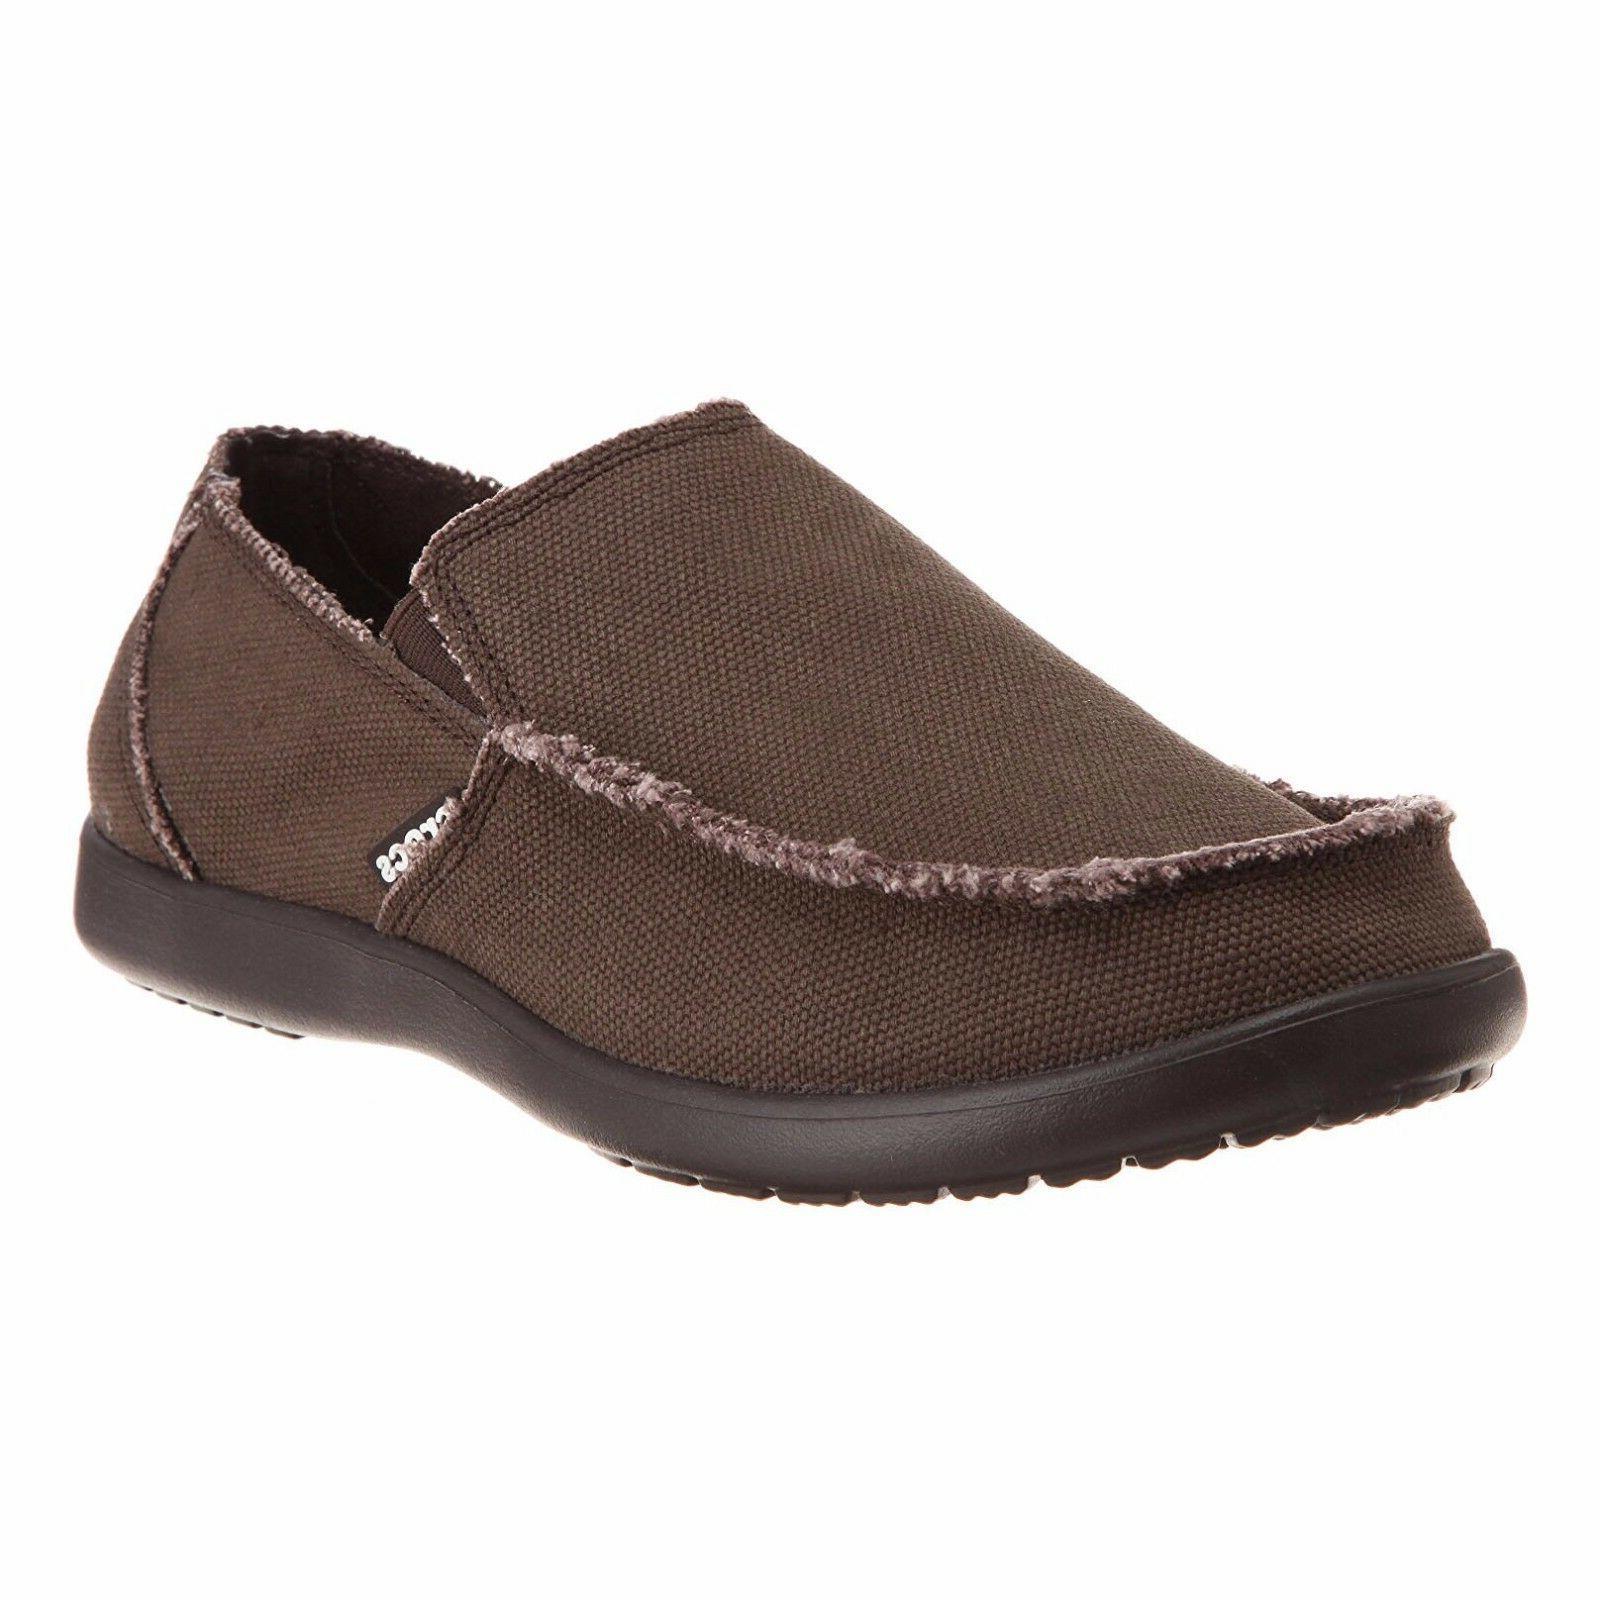 Mens Crocs Santa Cruz Fashion Loafer Khaki Espresso Casual B